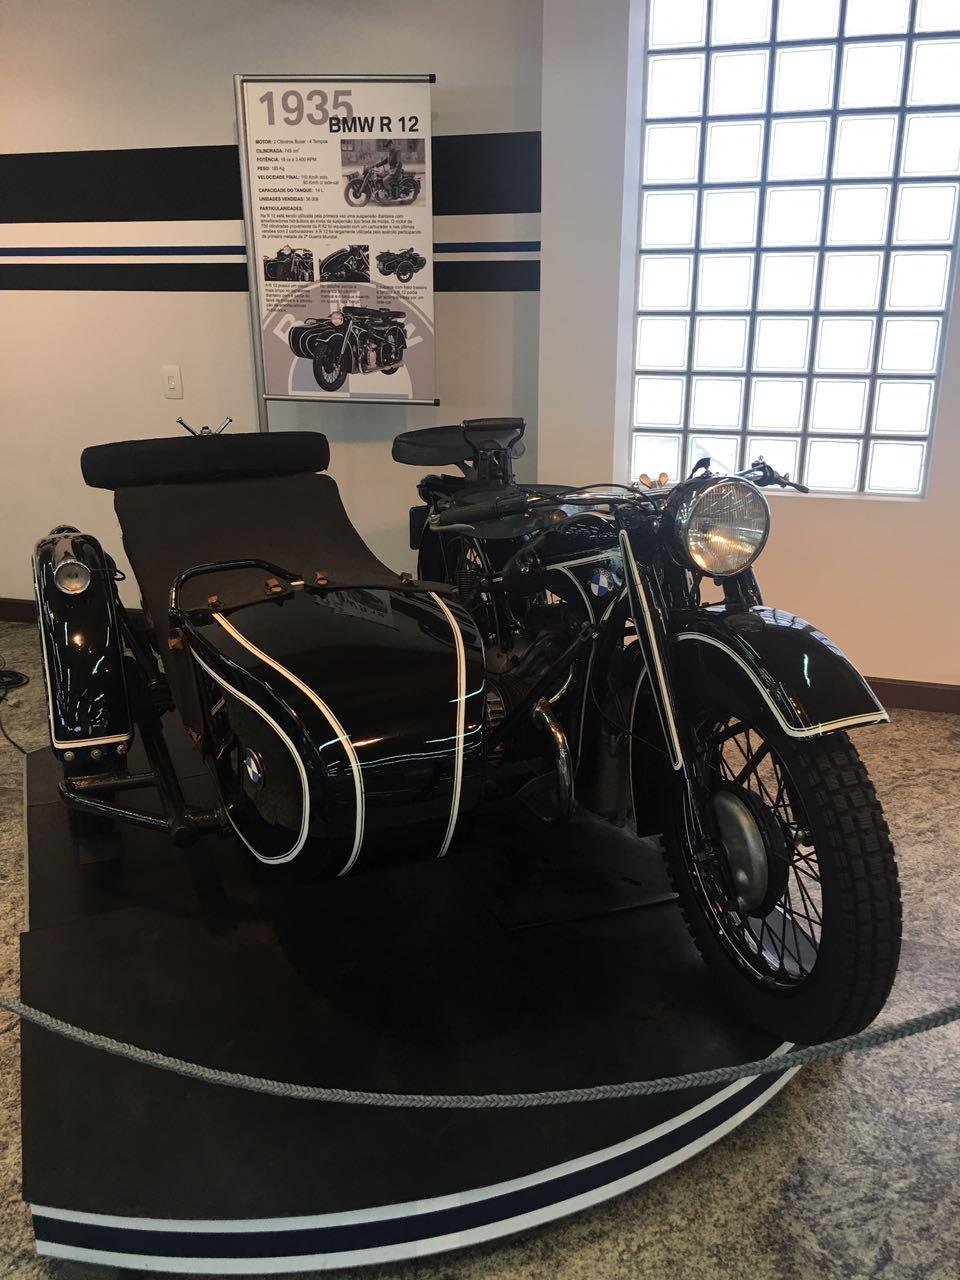 Museu motos BMW